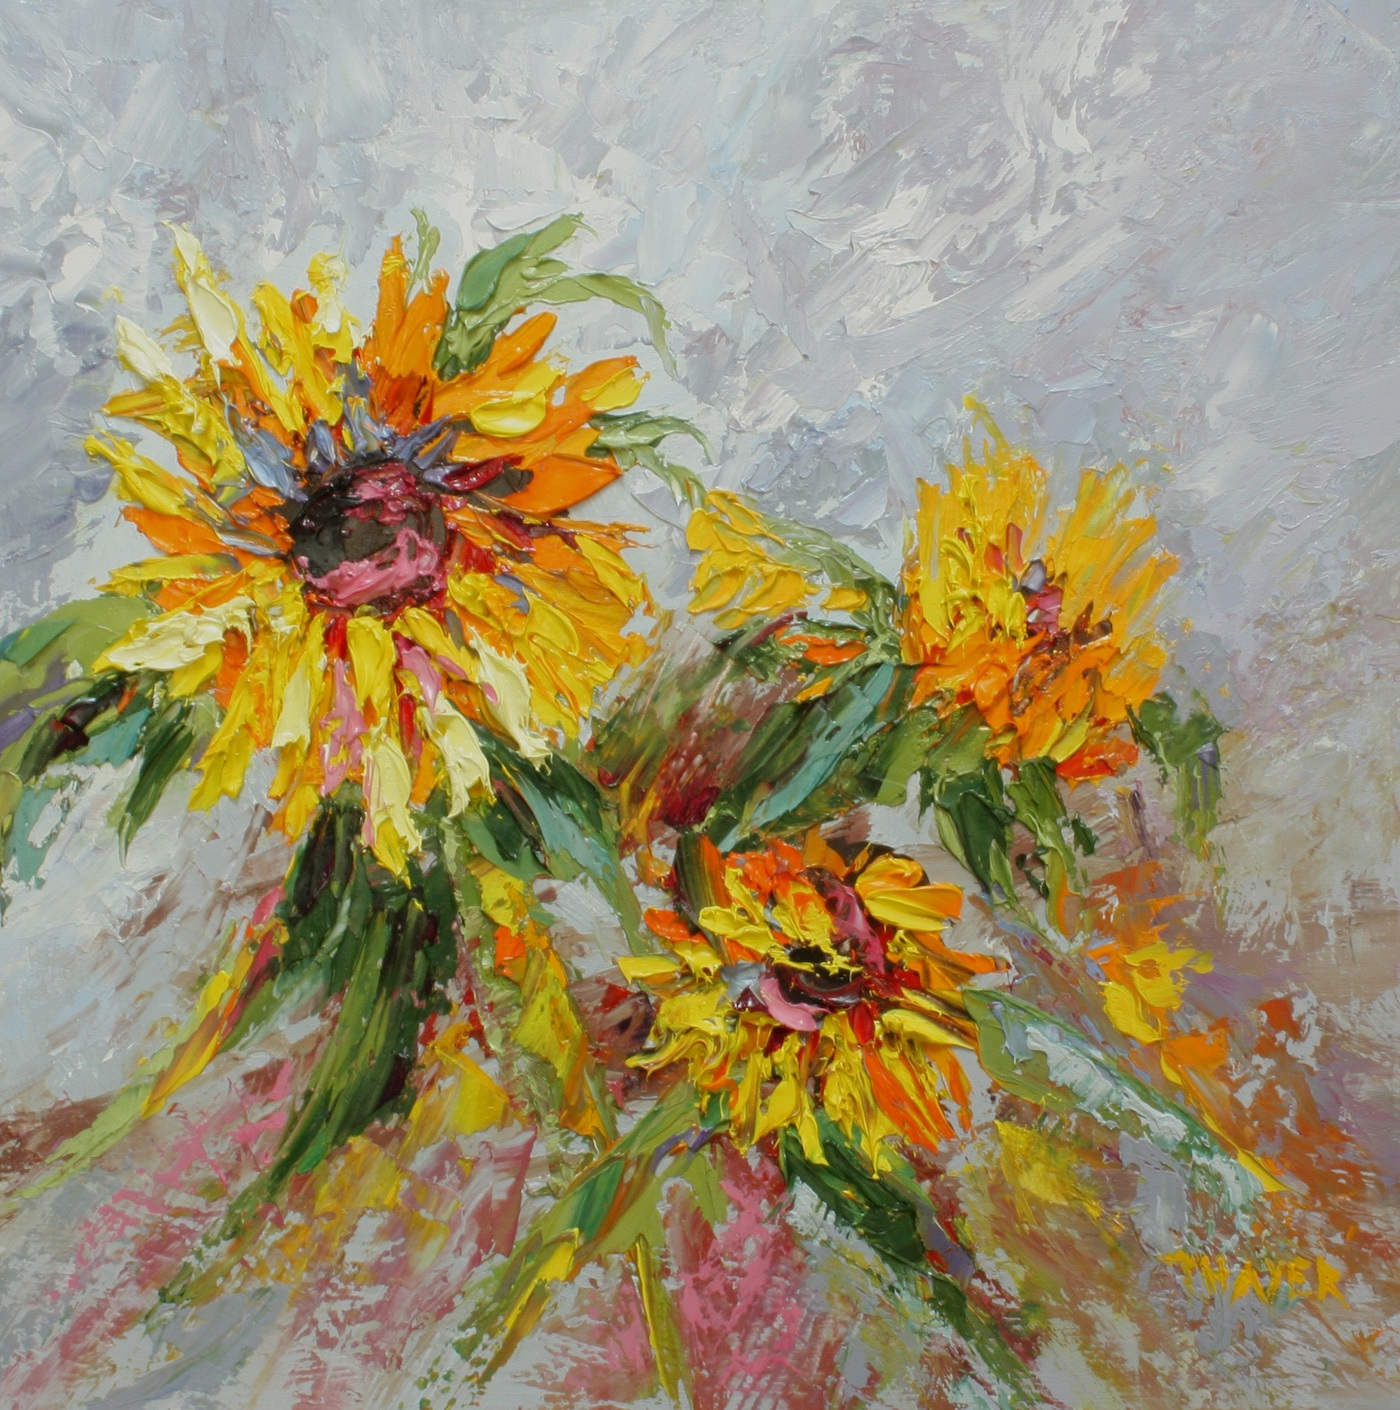 438 Flowers Of The Sun I copy.JPG